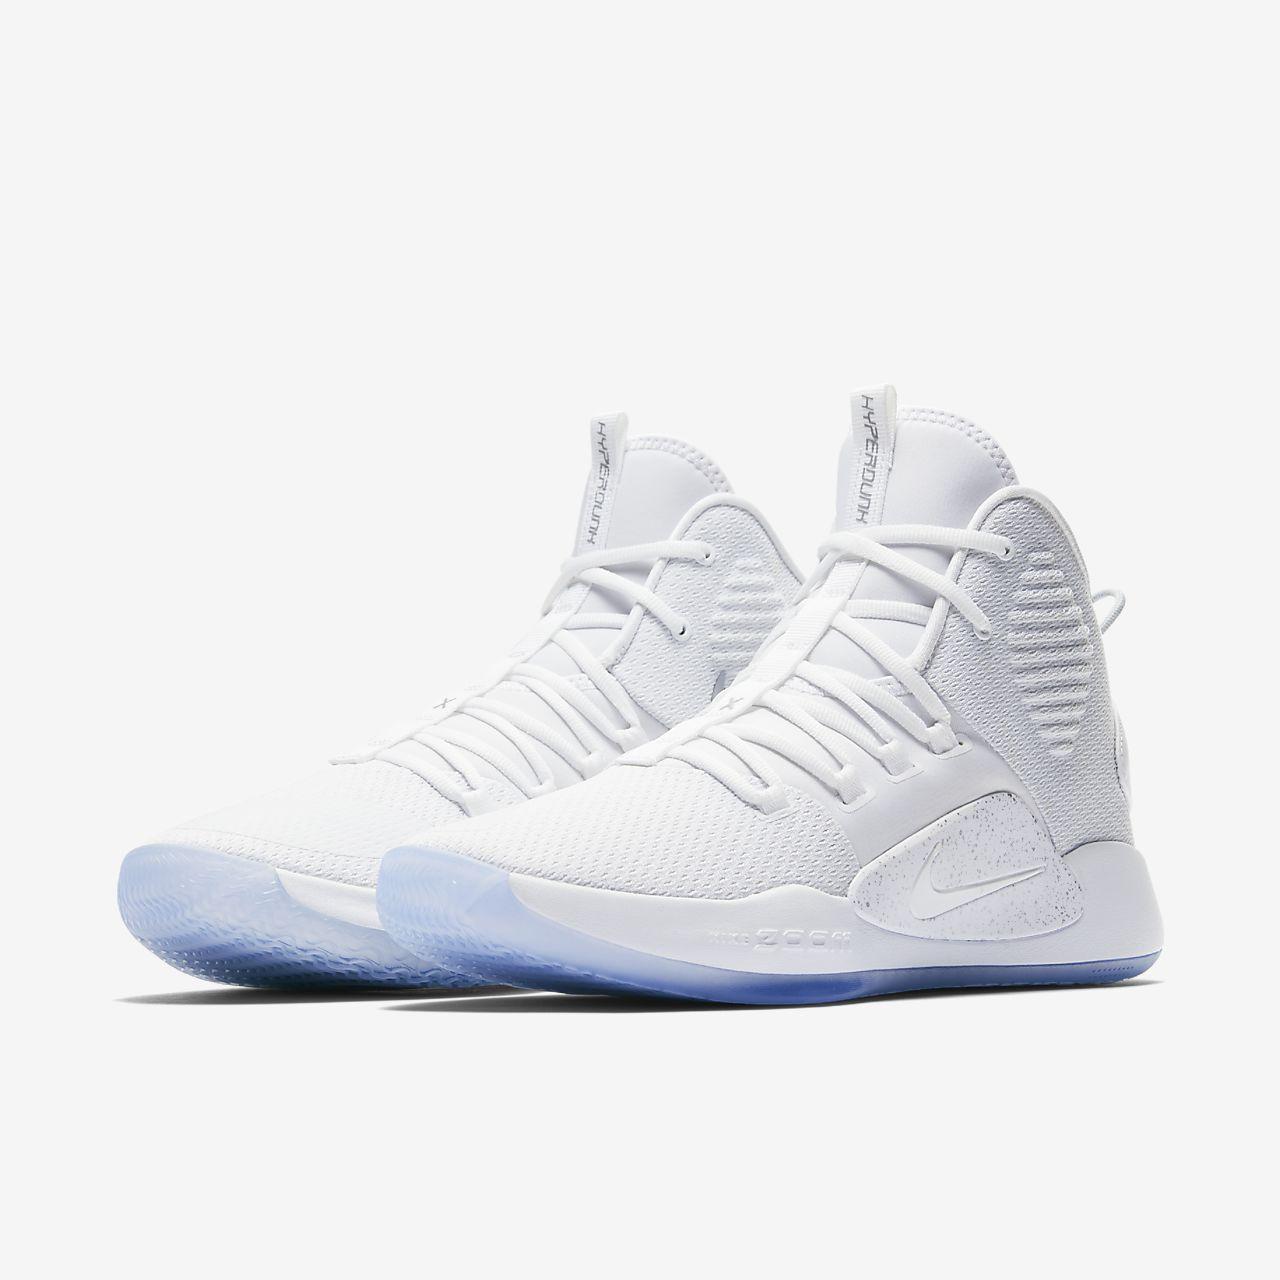 new style 2a92f eb32e Nike Hyperdunk X Basketball Shoe